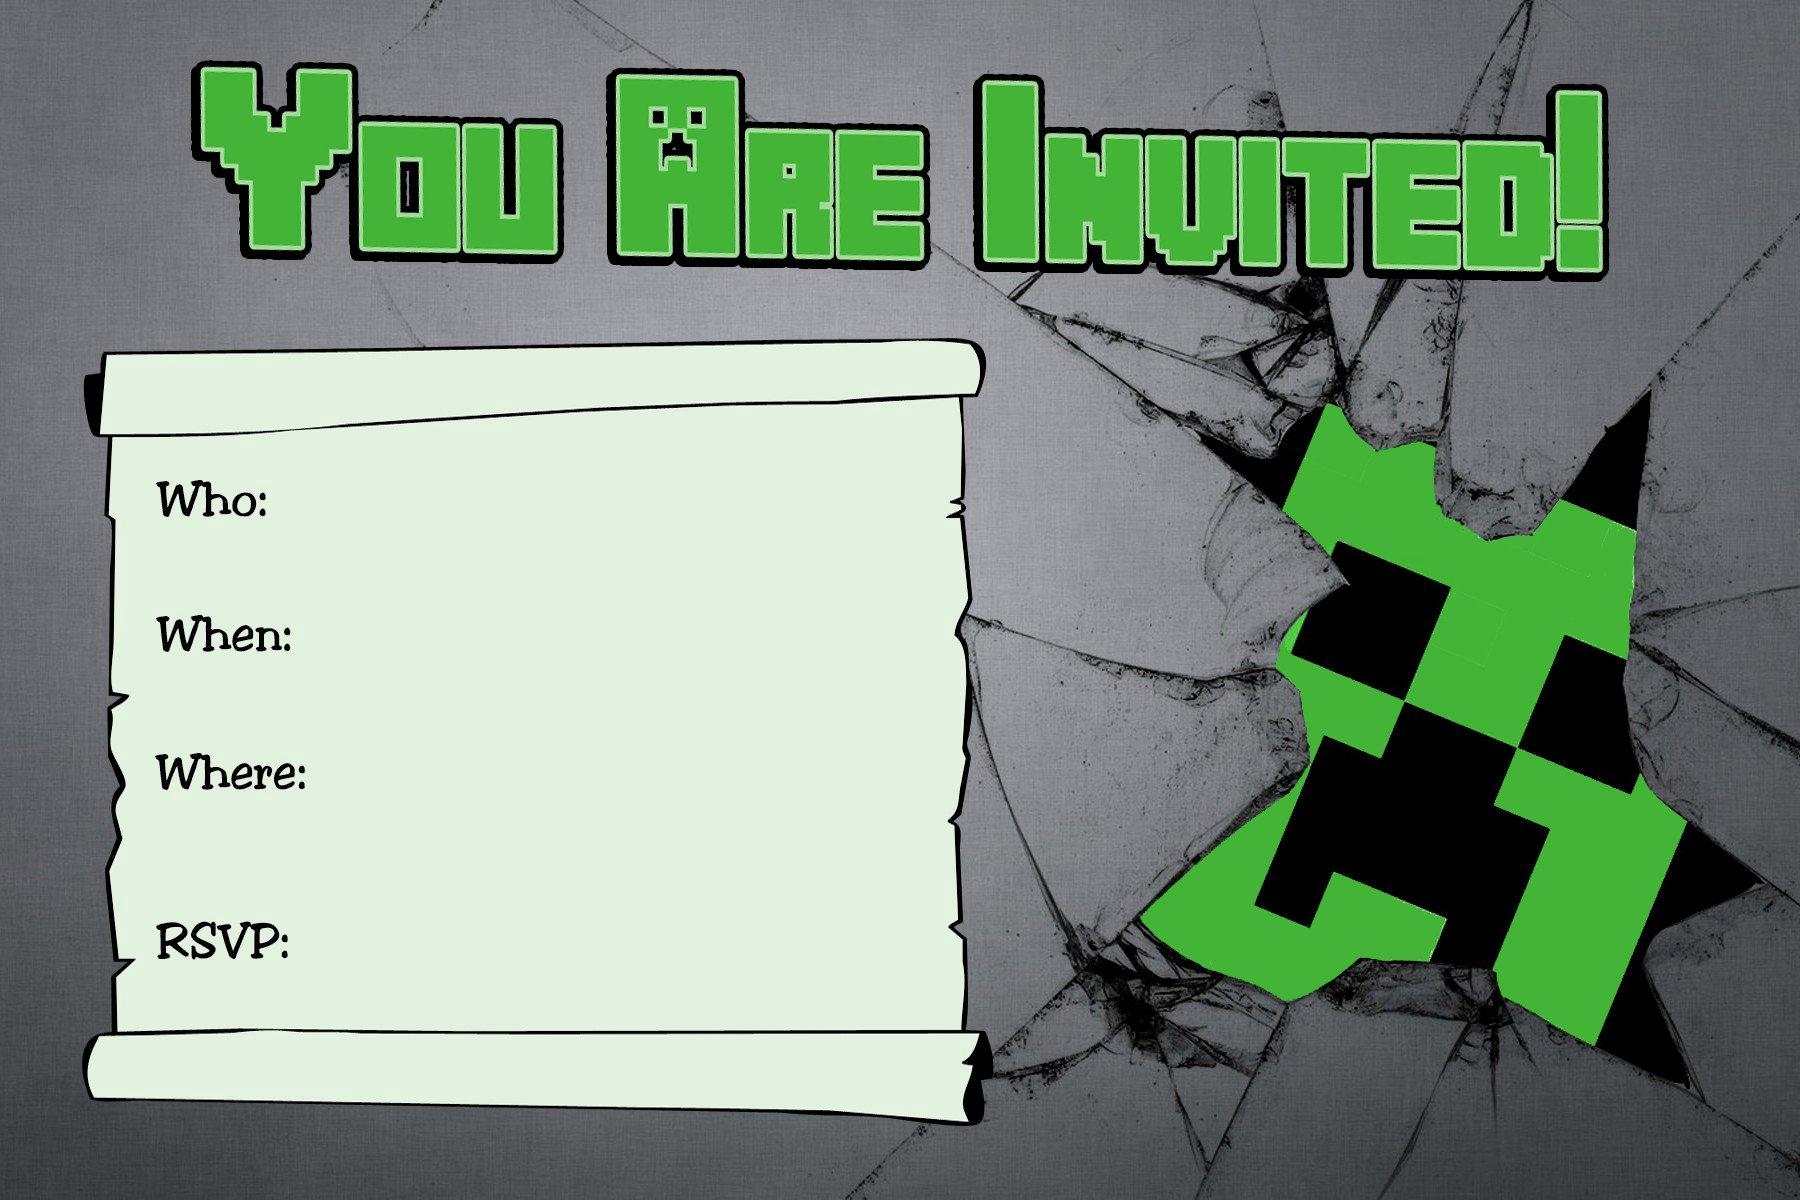 Free Minecraft Invitation Template Inspirational 40th Birthday Ideas Free Printable Minecraft Birthday